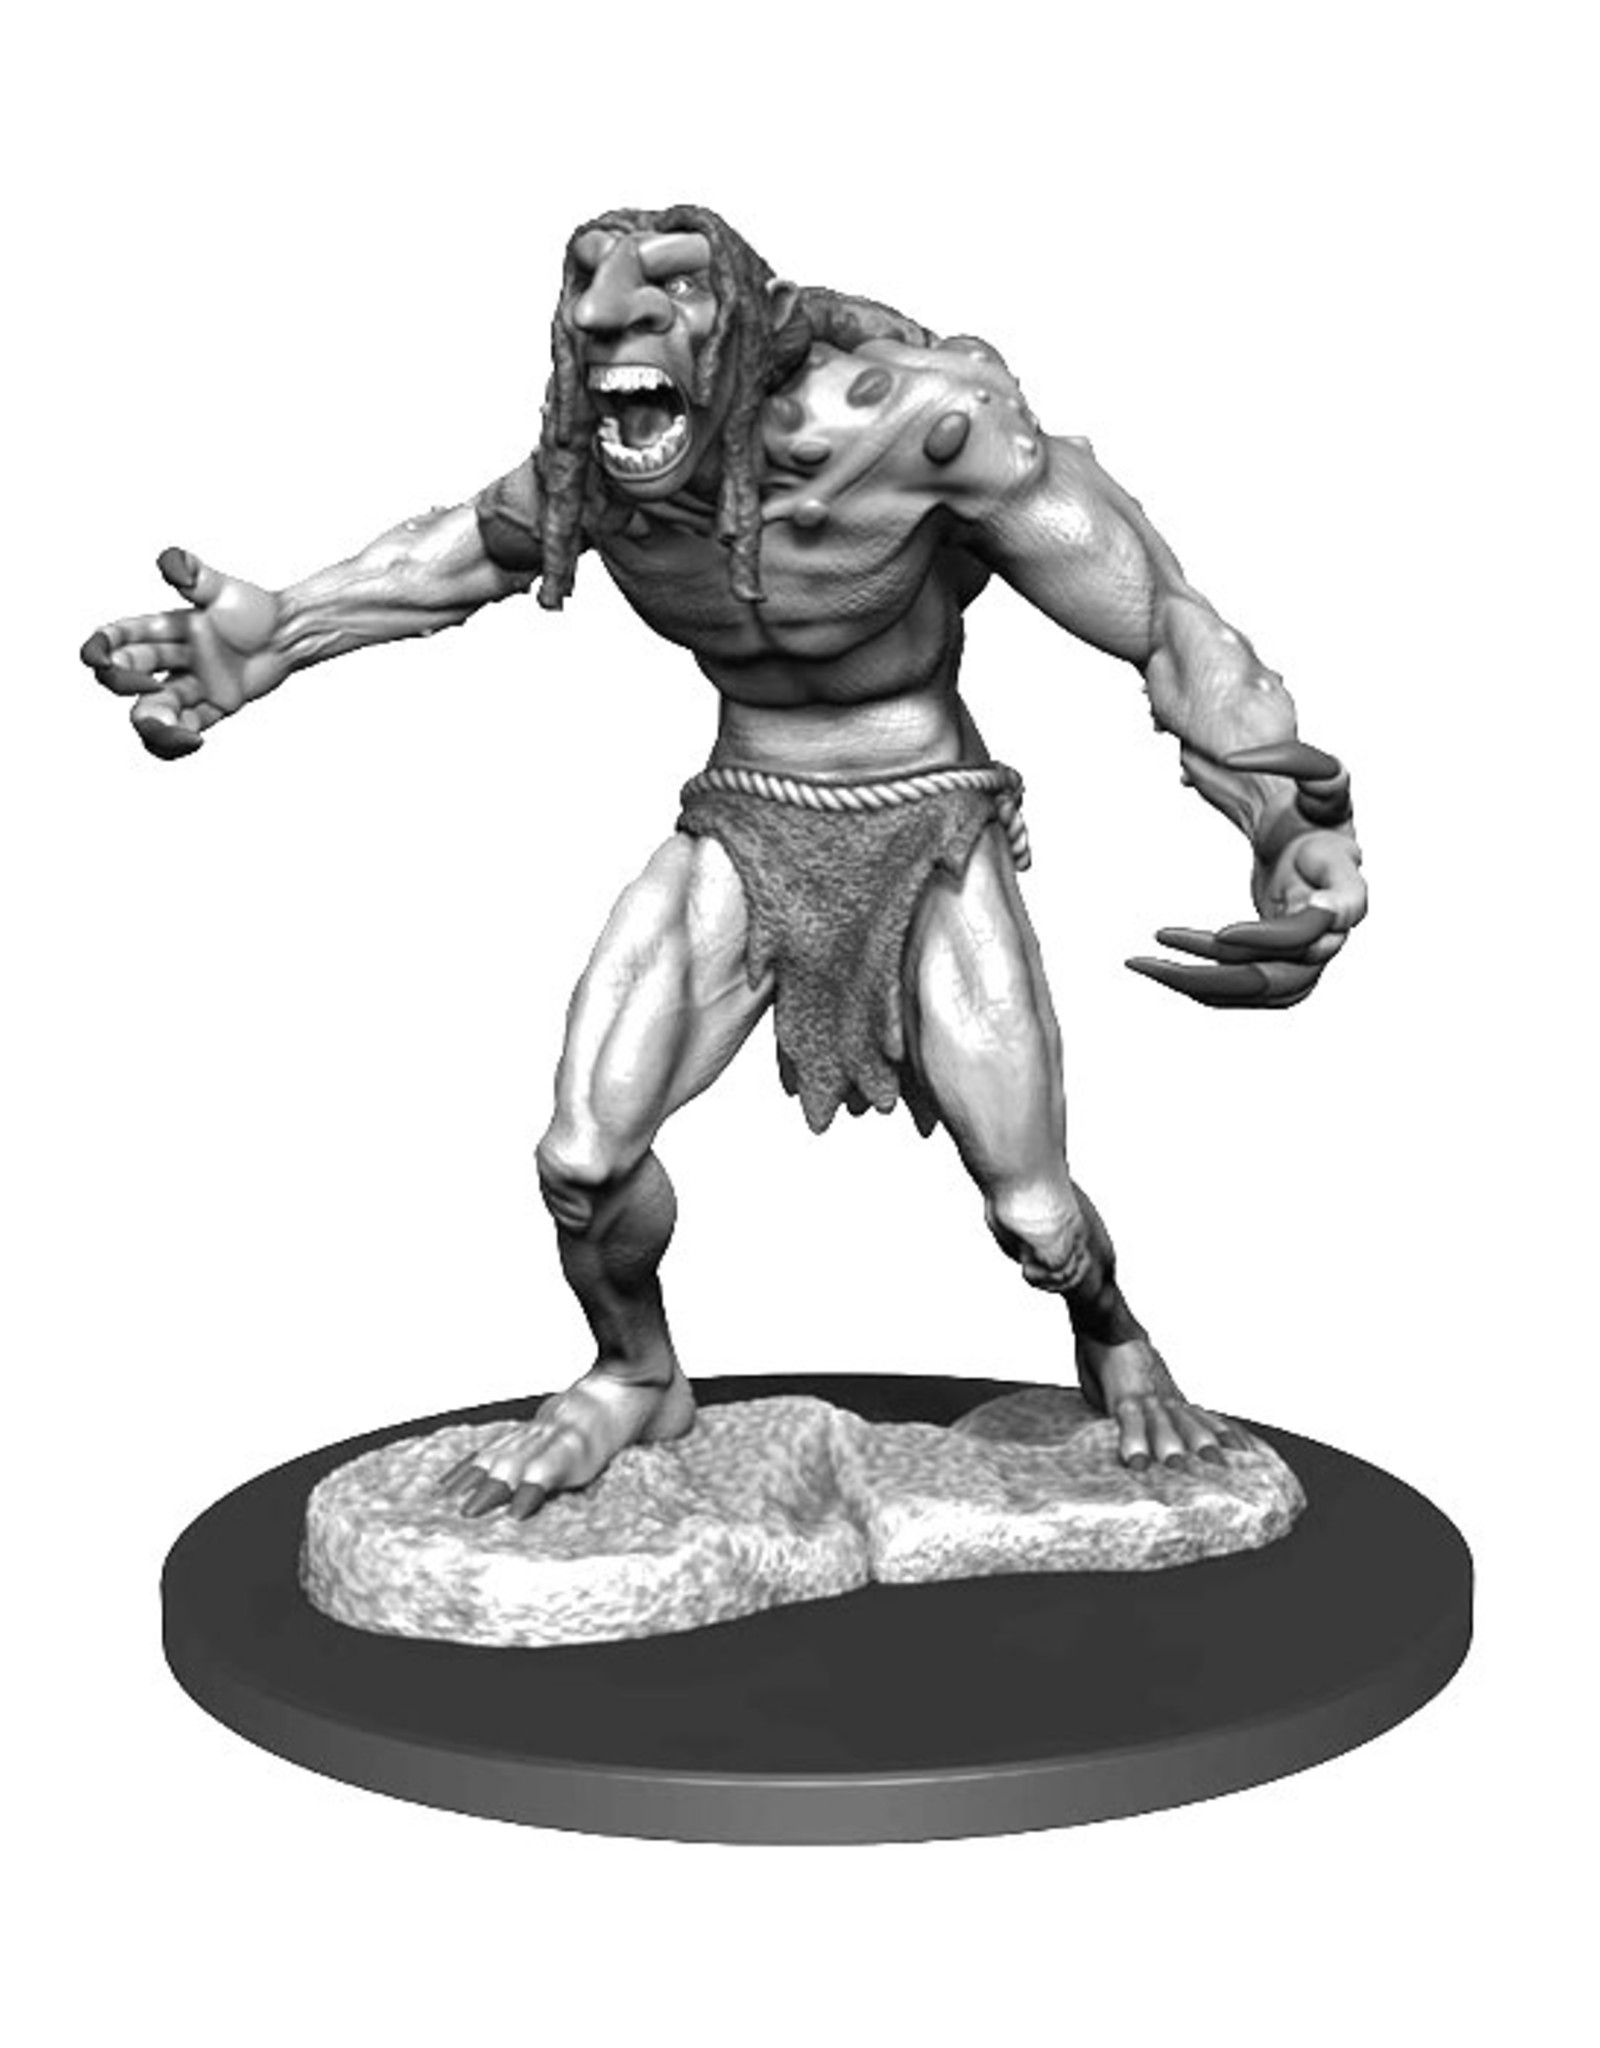 Dungeons & Dragons Dungeons & Dragons: Nolzur's - Raging Troll